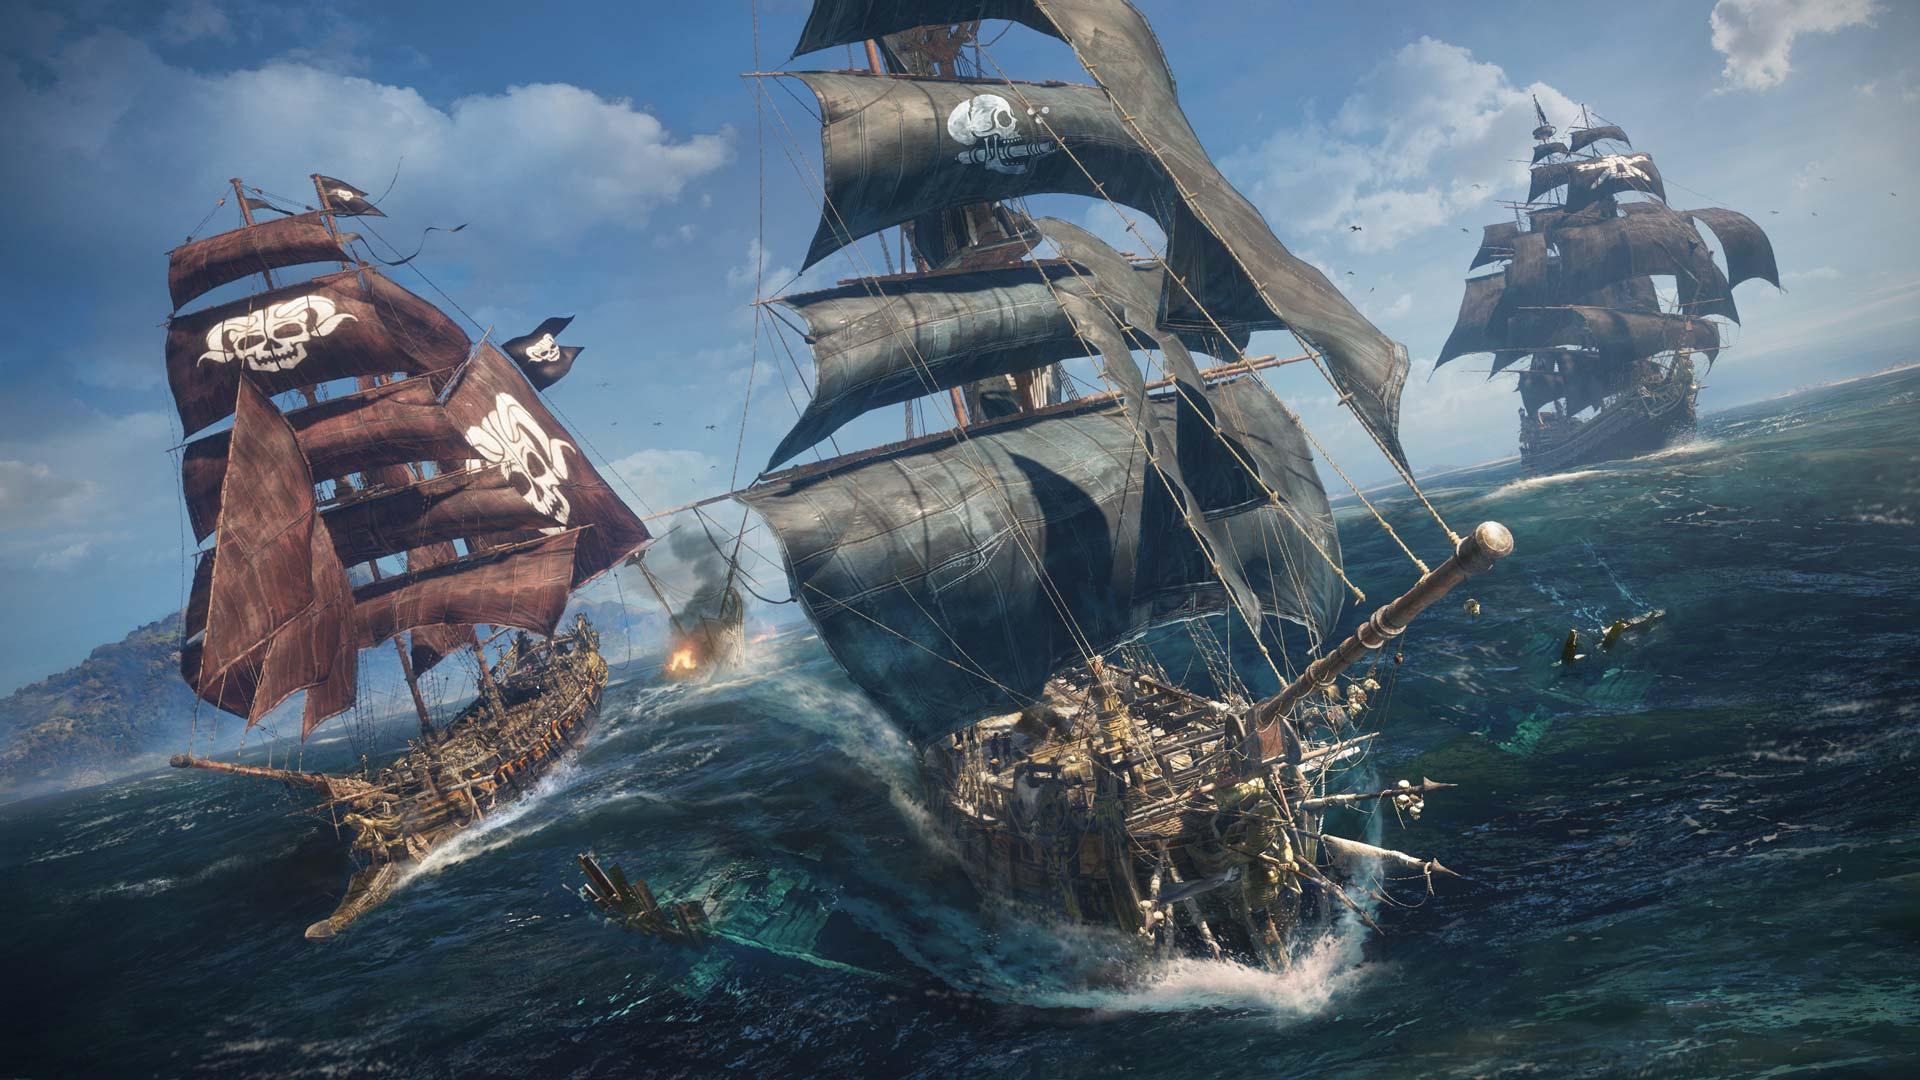 Skull & Bones: Sea battles and beta access